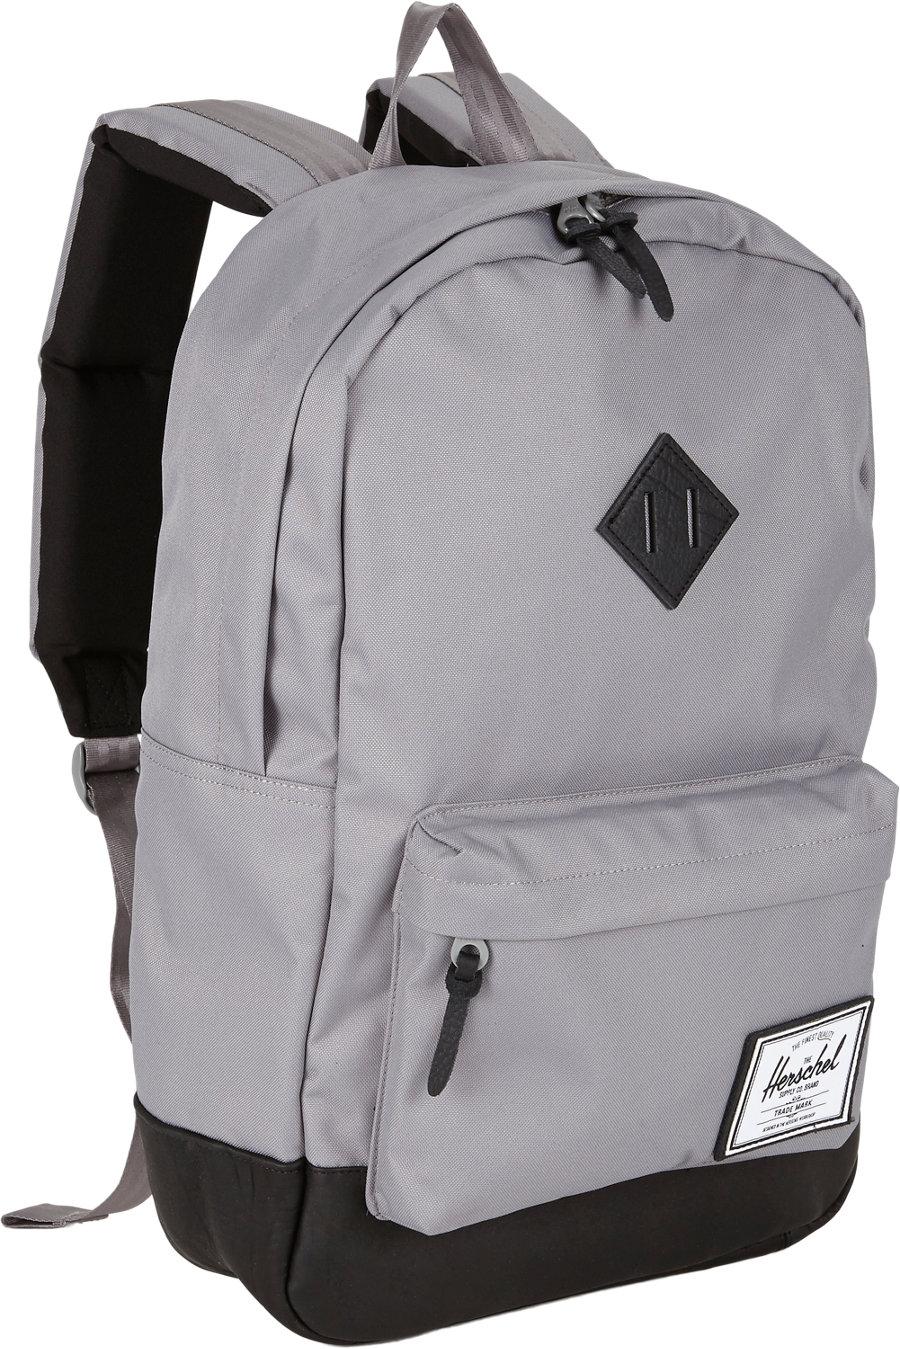 Herschel Supply Co. Backpack in Gray for Men - Lyst